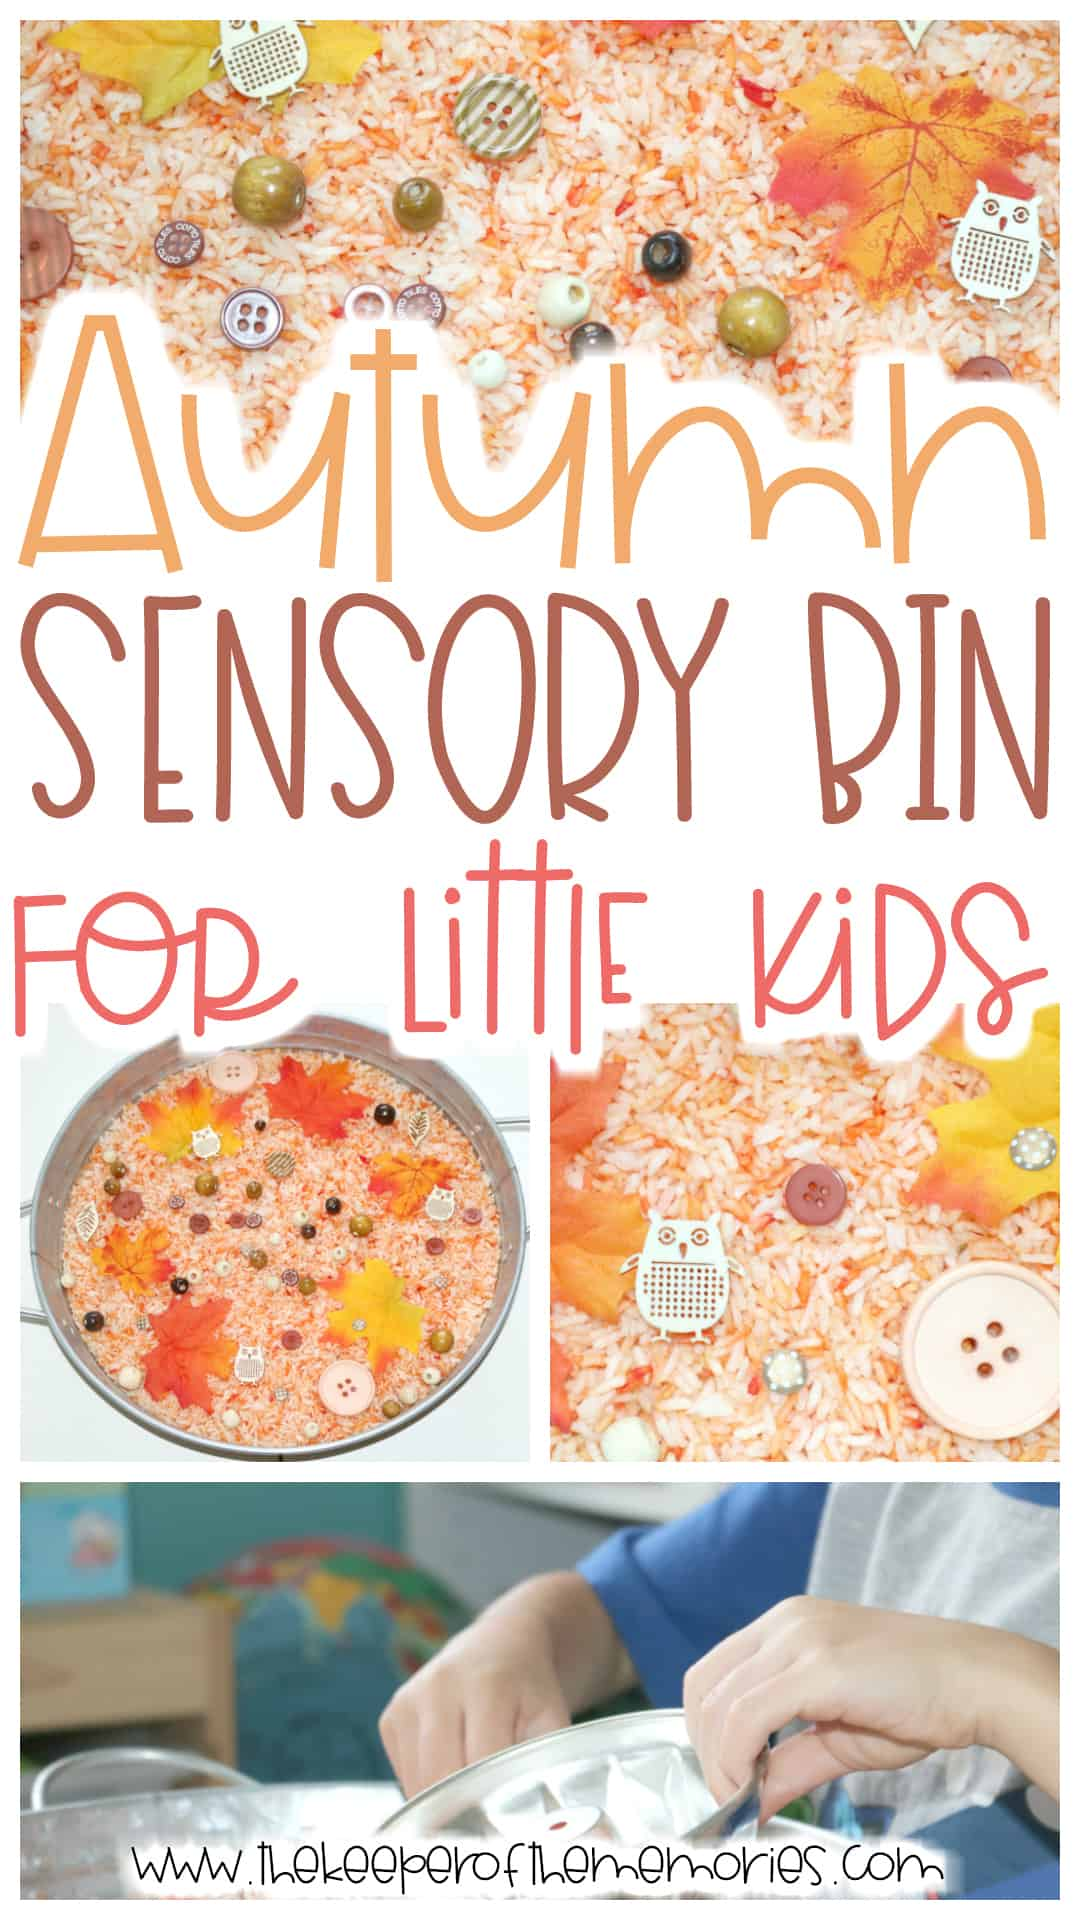 Autumn Sensory Bin for Preschoolers & Kindergartners